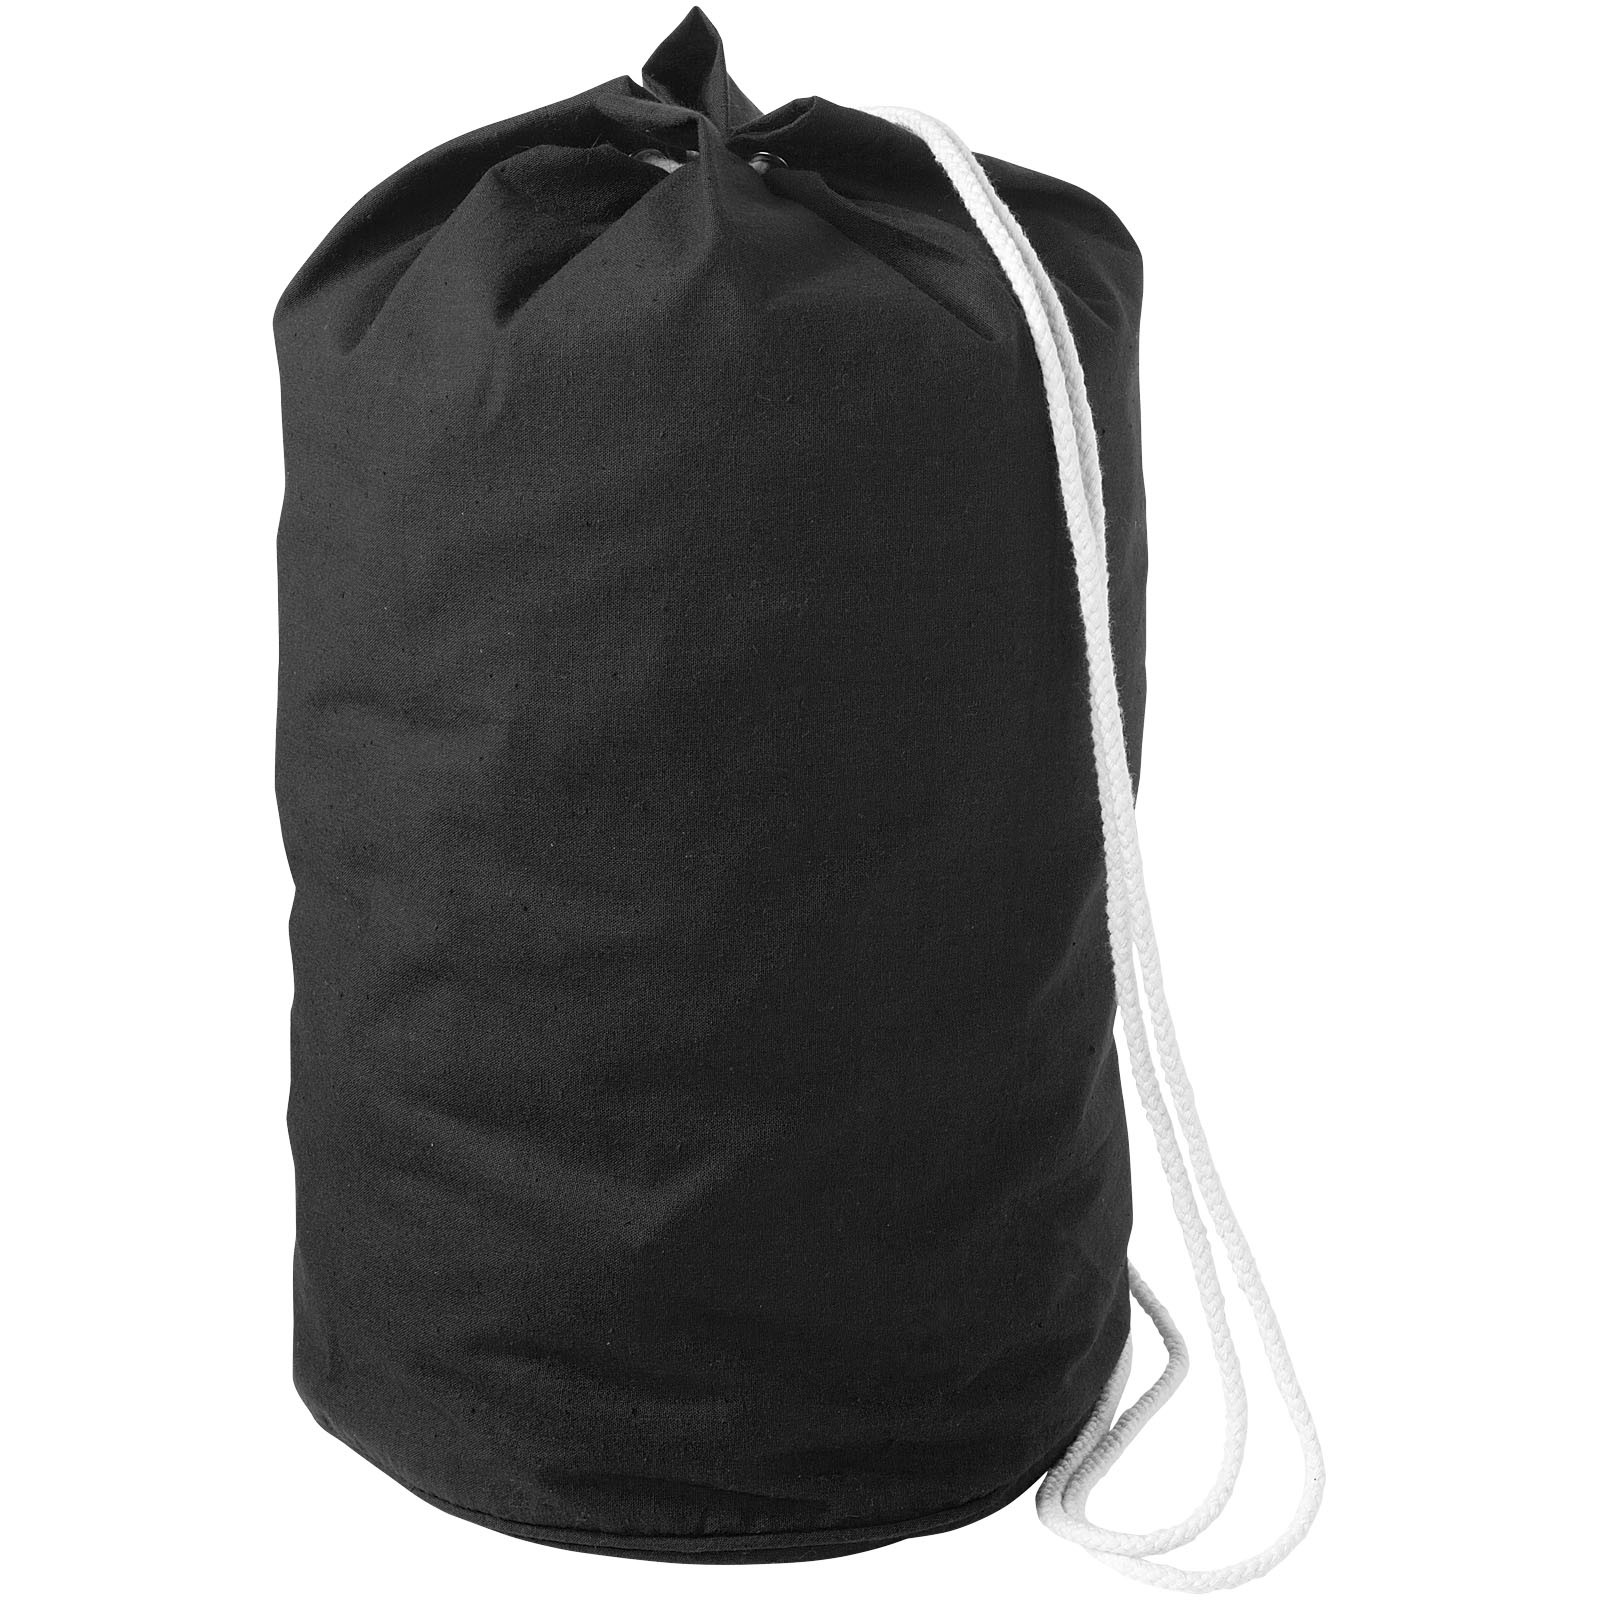 Missouri cotton sailor duffel bag - Solid black